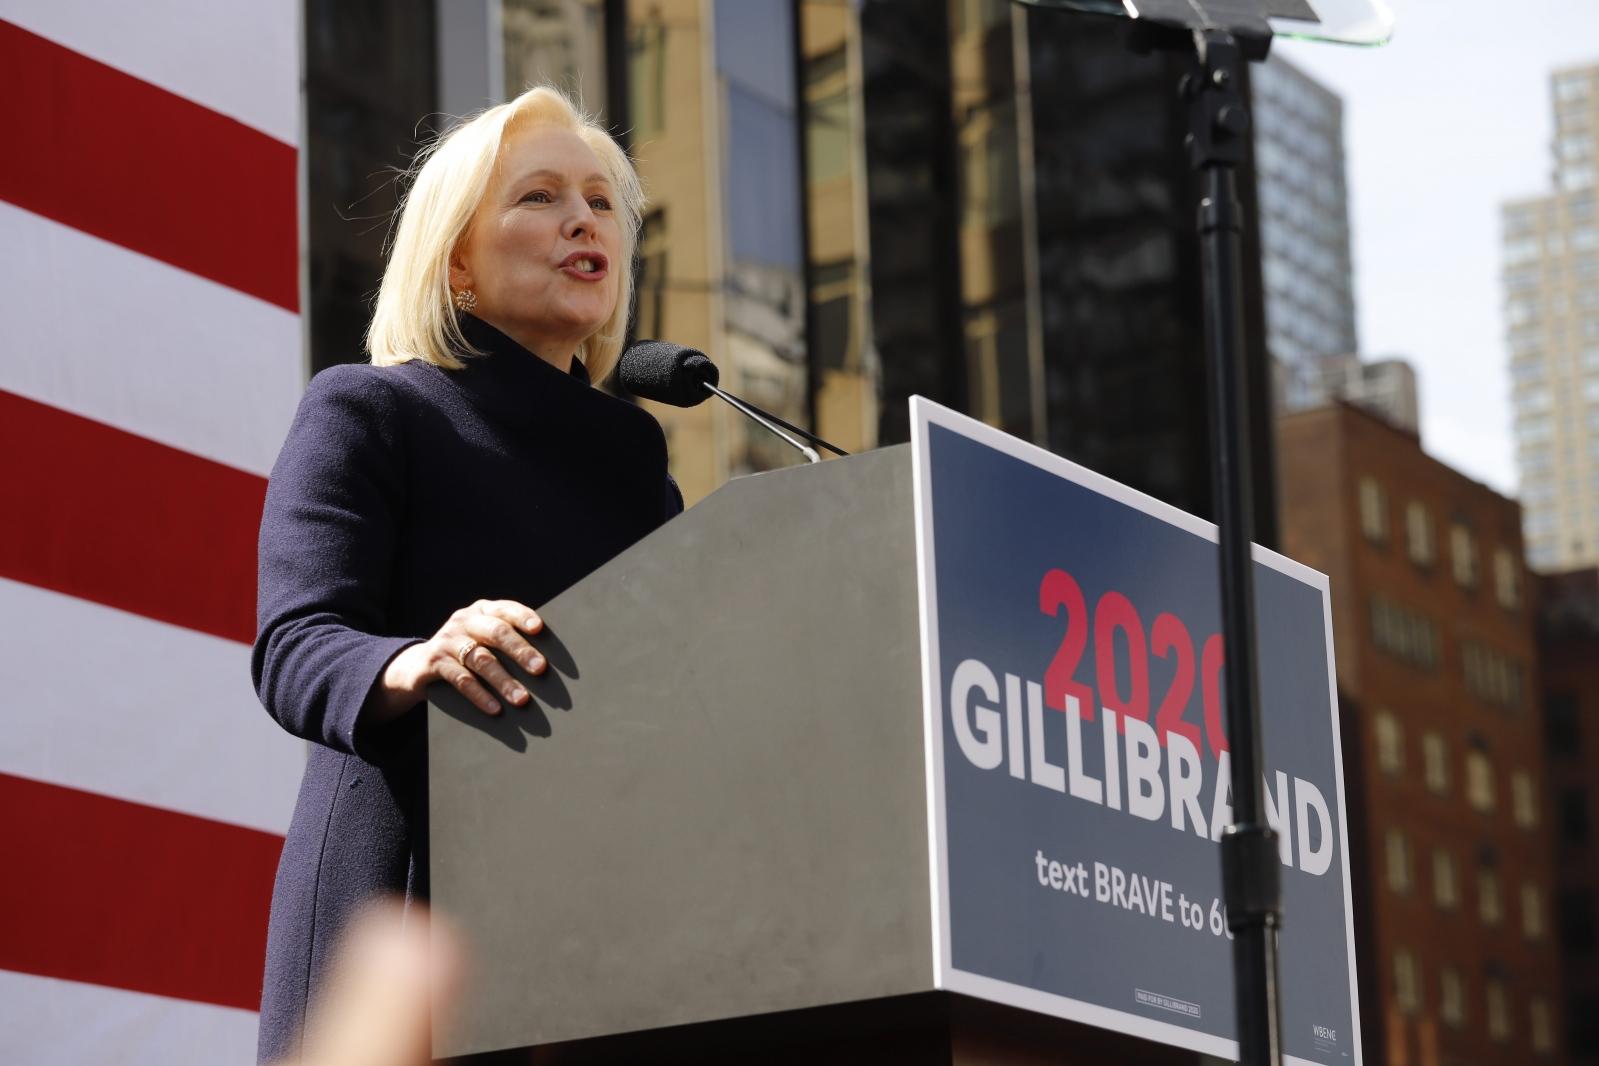 United States Senator Kirsten Gillibrand kicks off her presidential campaign in Manhattan in front of Trump International Hotel, New York, March 24, 2019